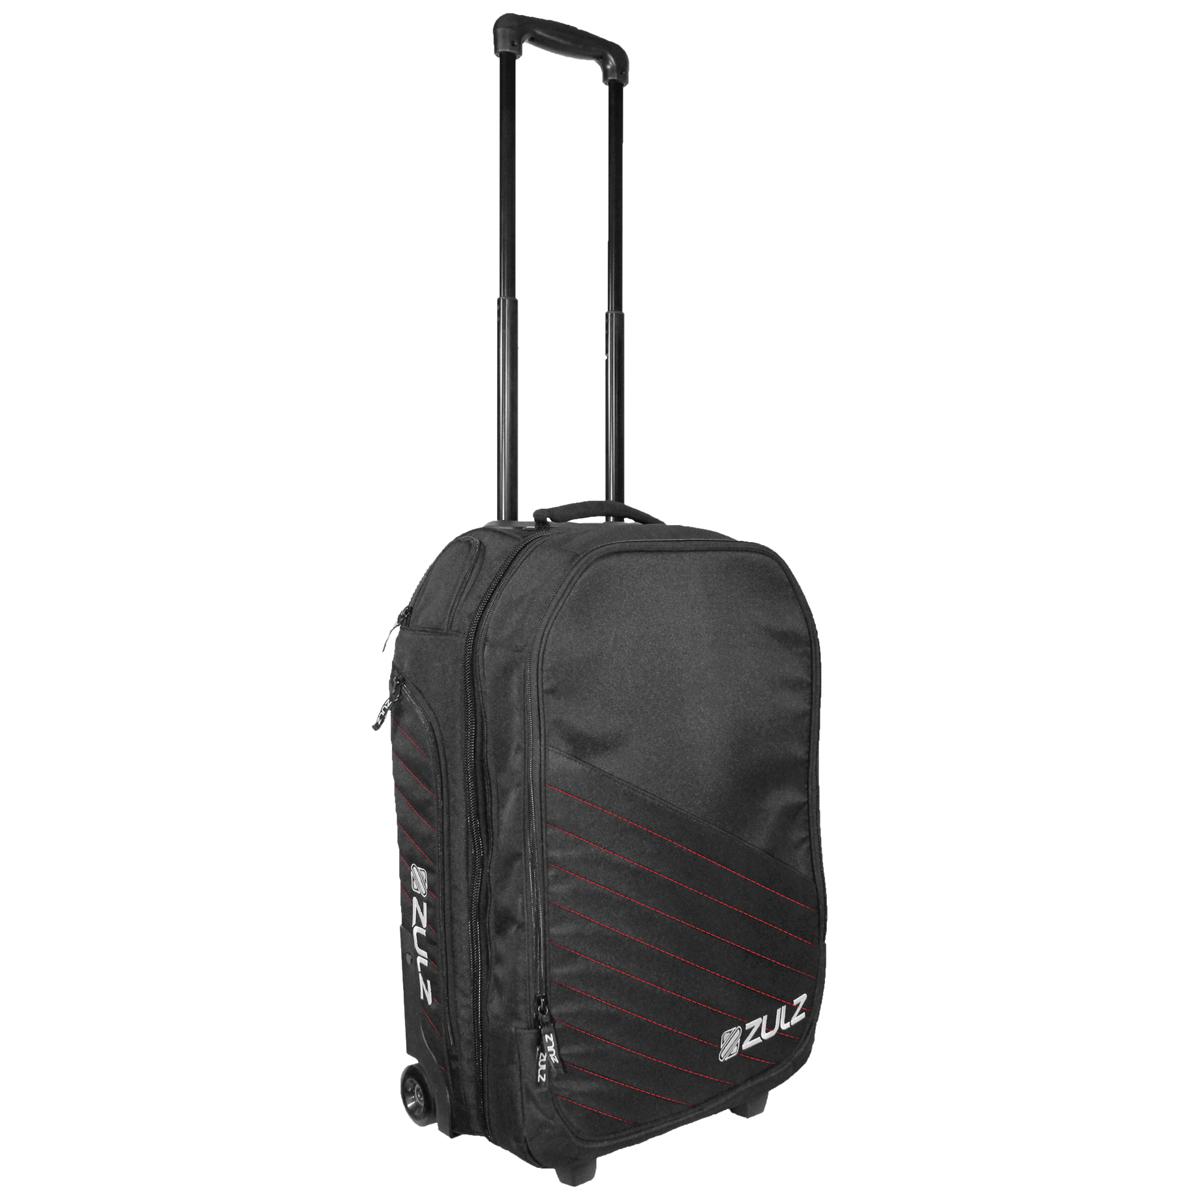 Zulz Primetime Black/Red Travel Bag